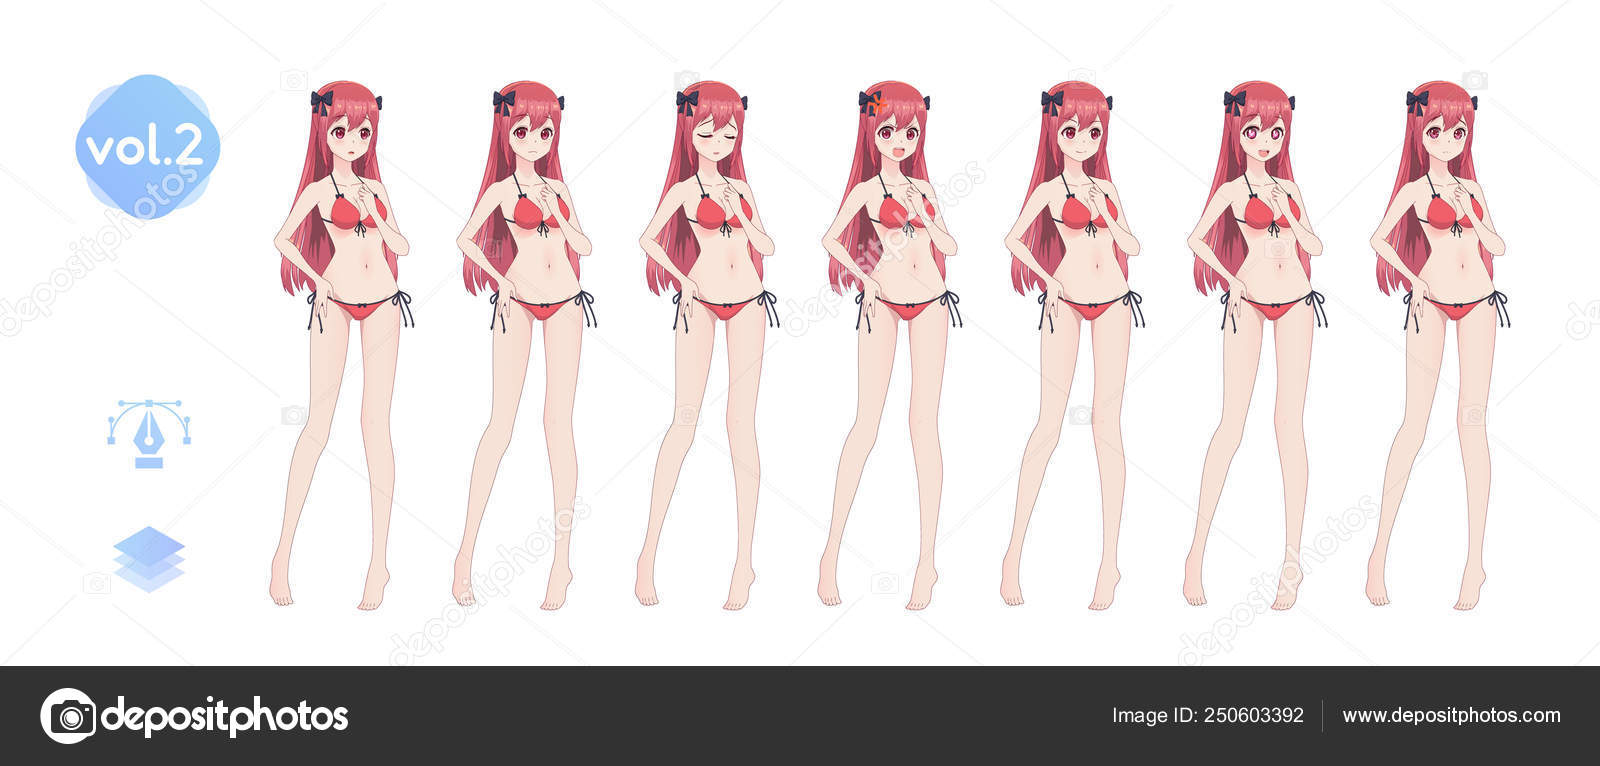 Anime dating visuella Roman spel